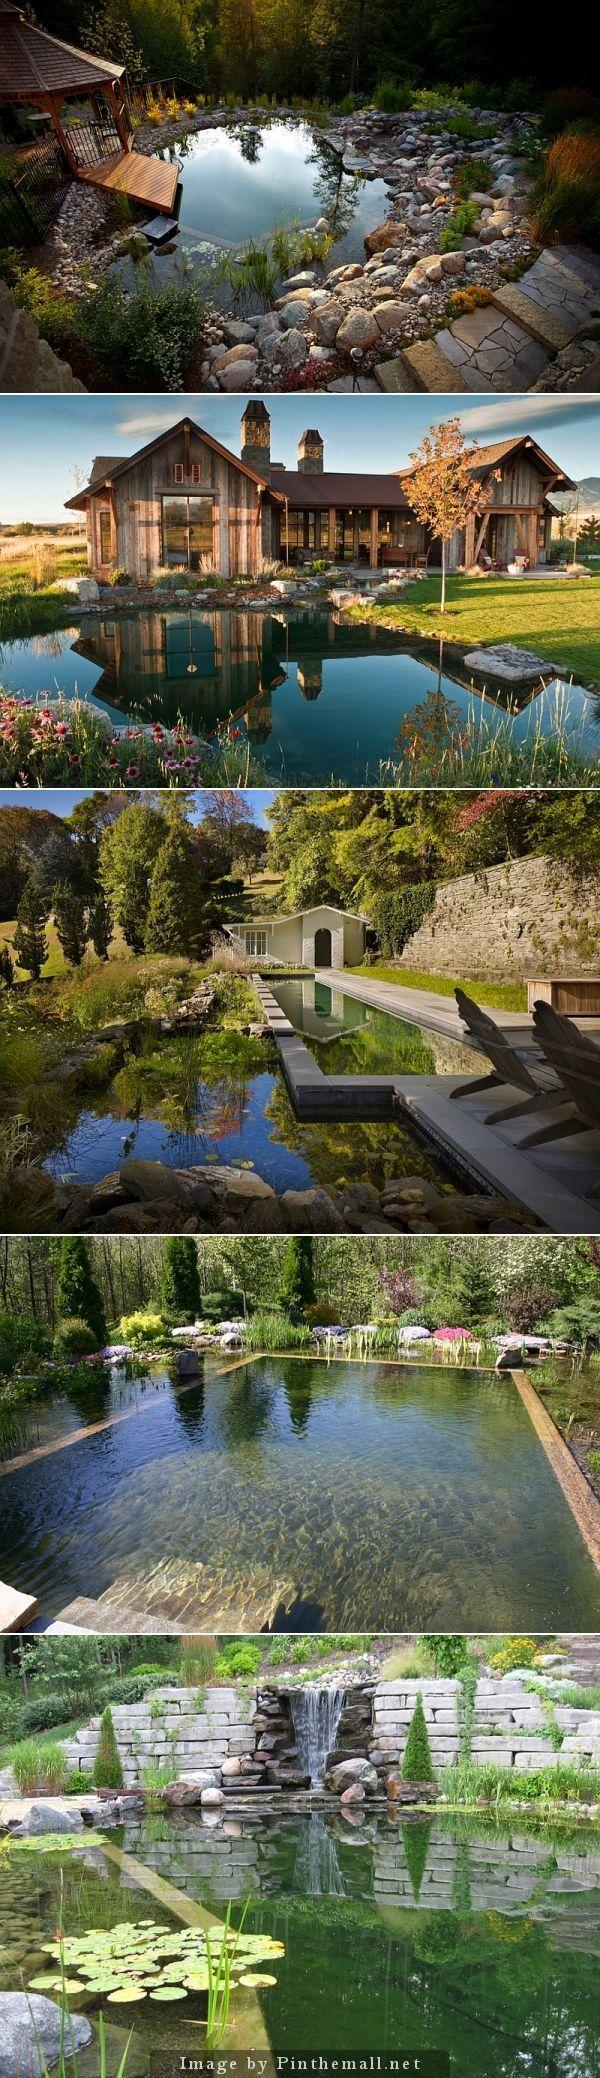 Inspirational natural swimming pool